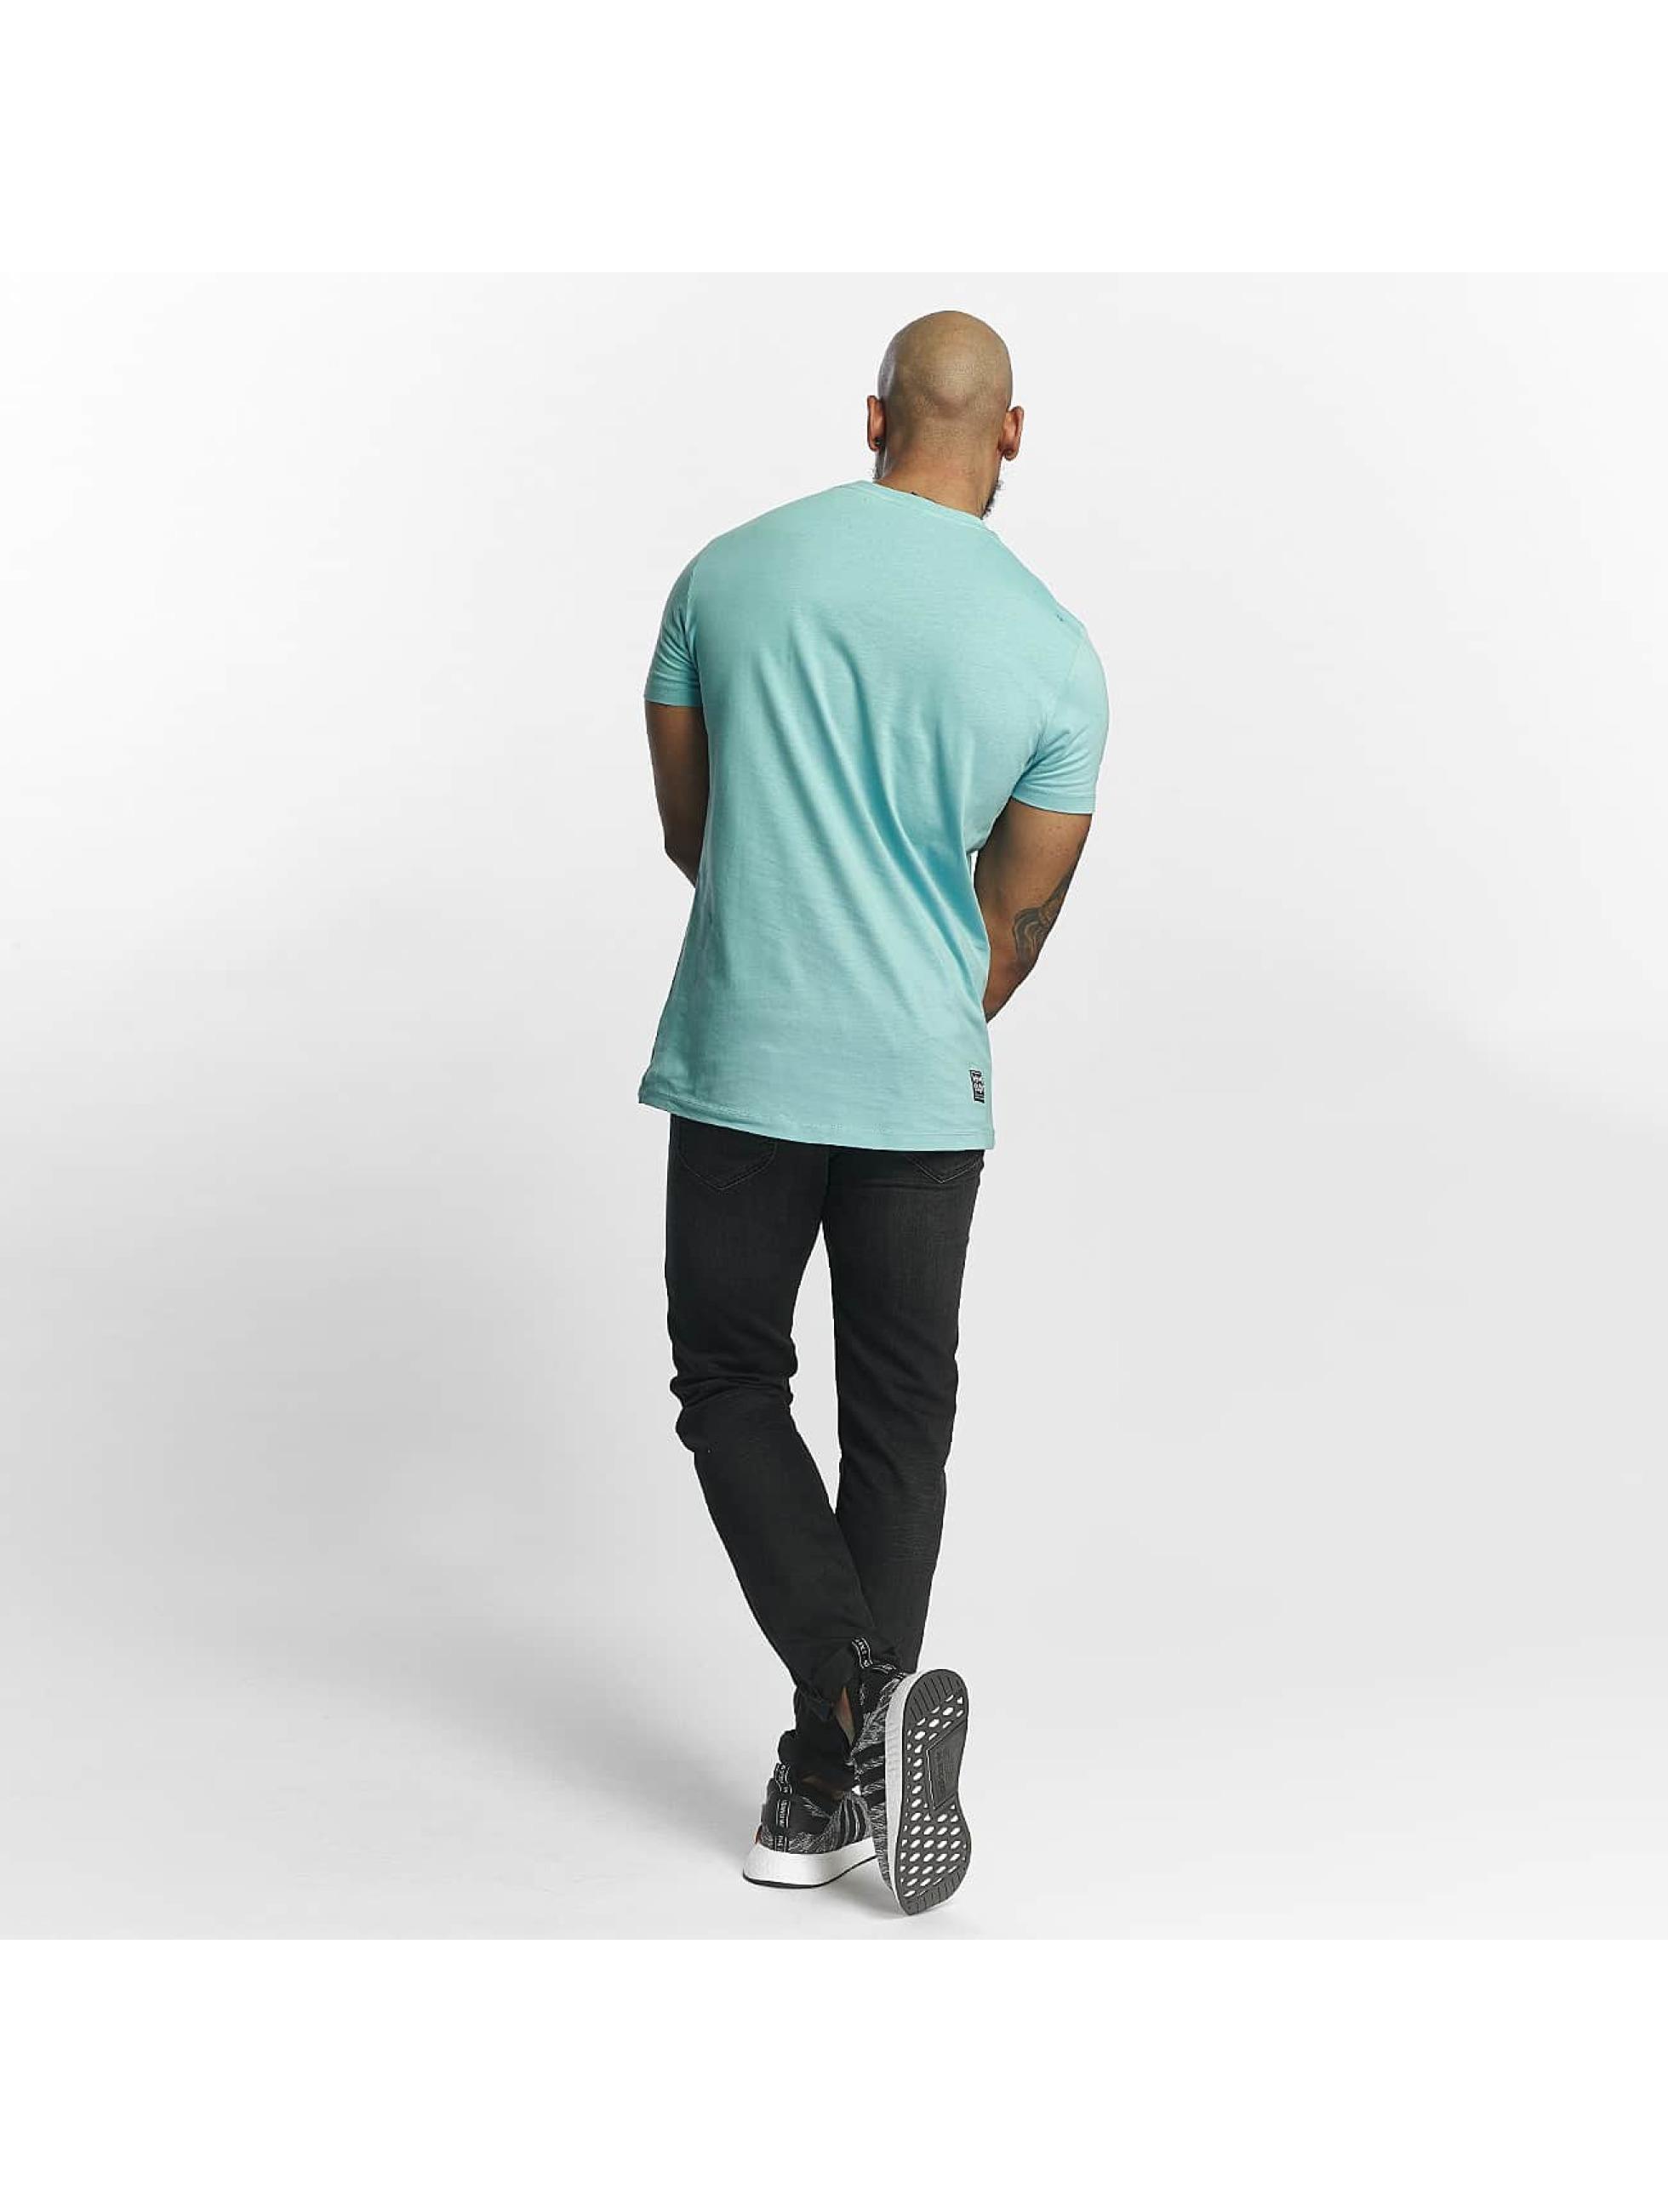 Homeboy T-Shirt Take You Home türkis